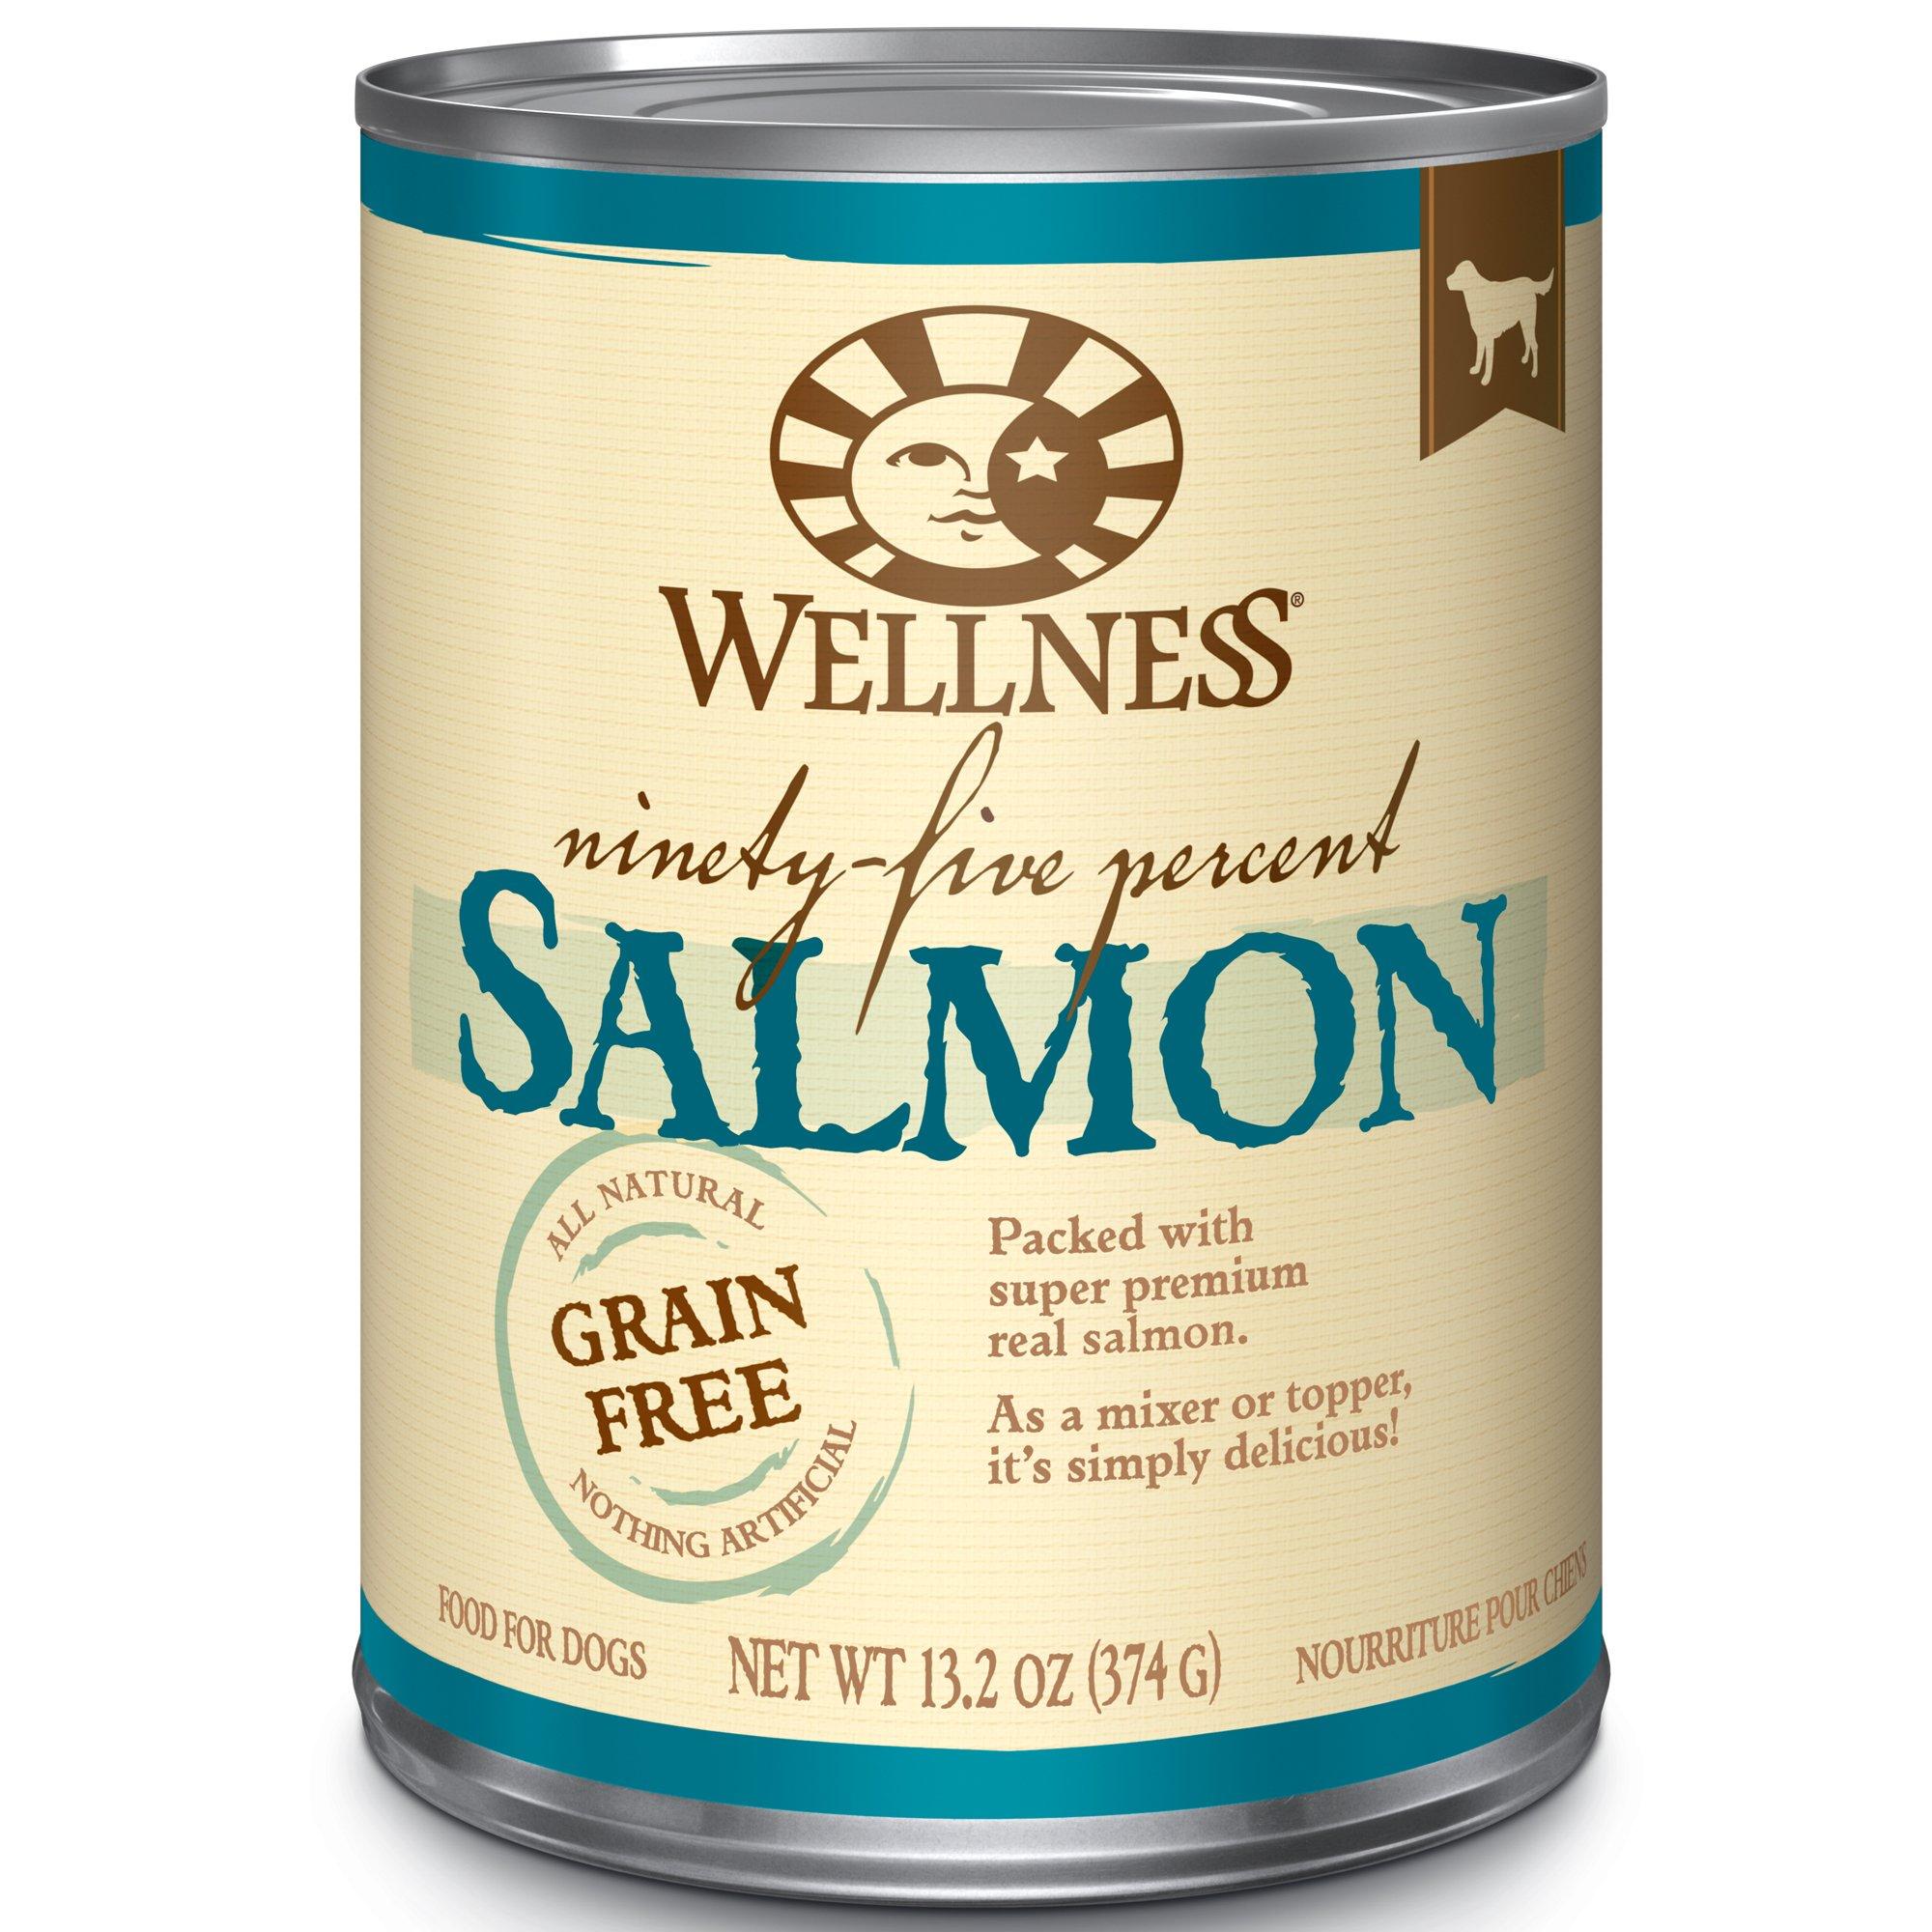 Wellness 95% Salmon Adult Canned Dog Food